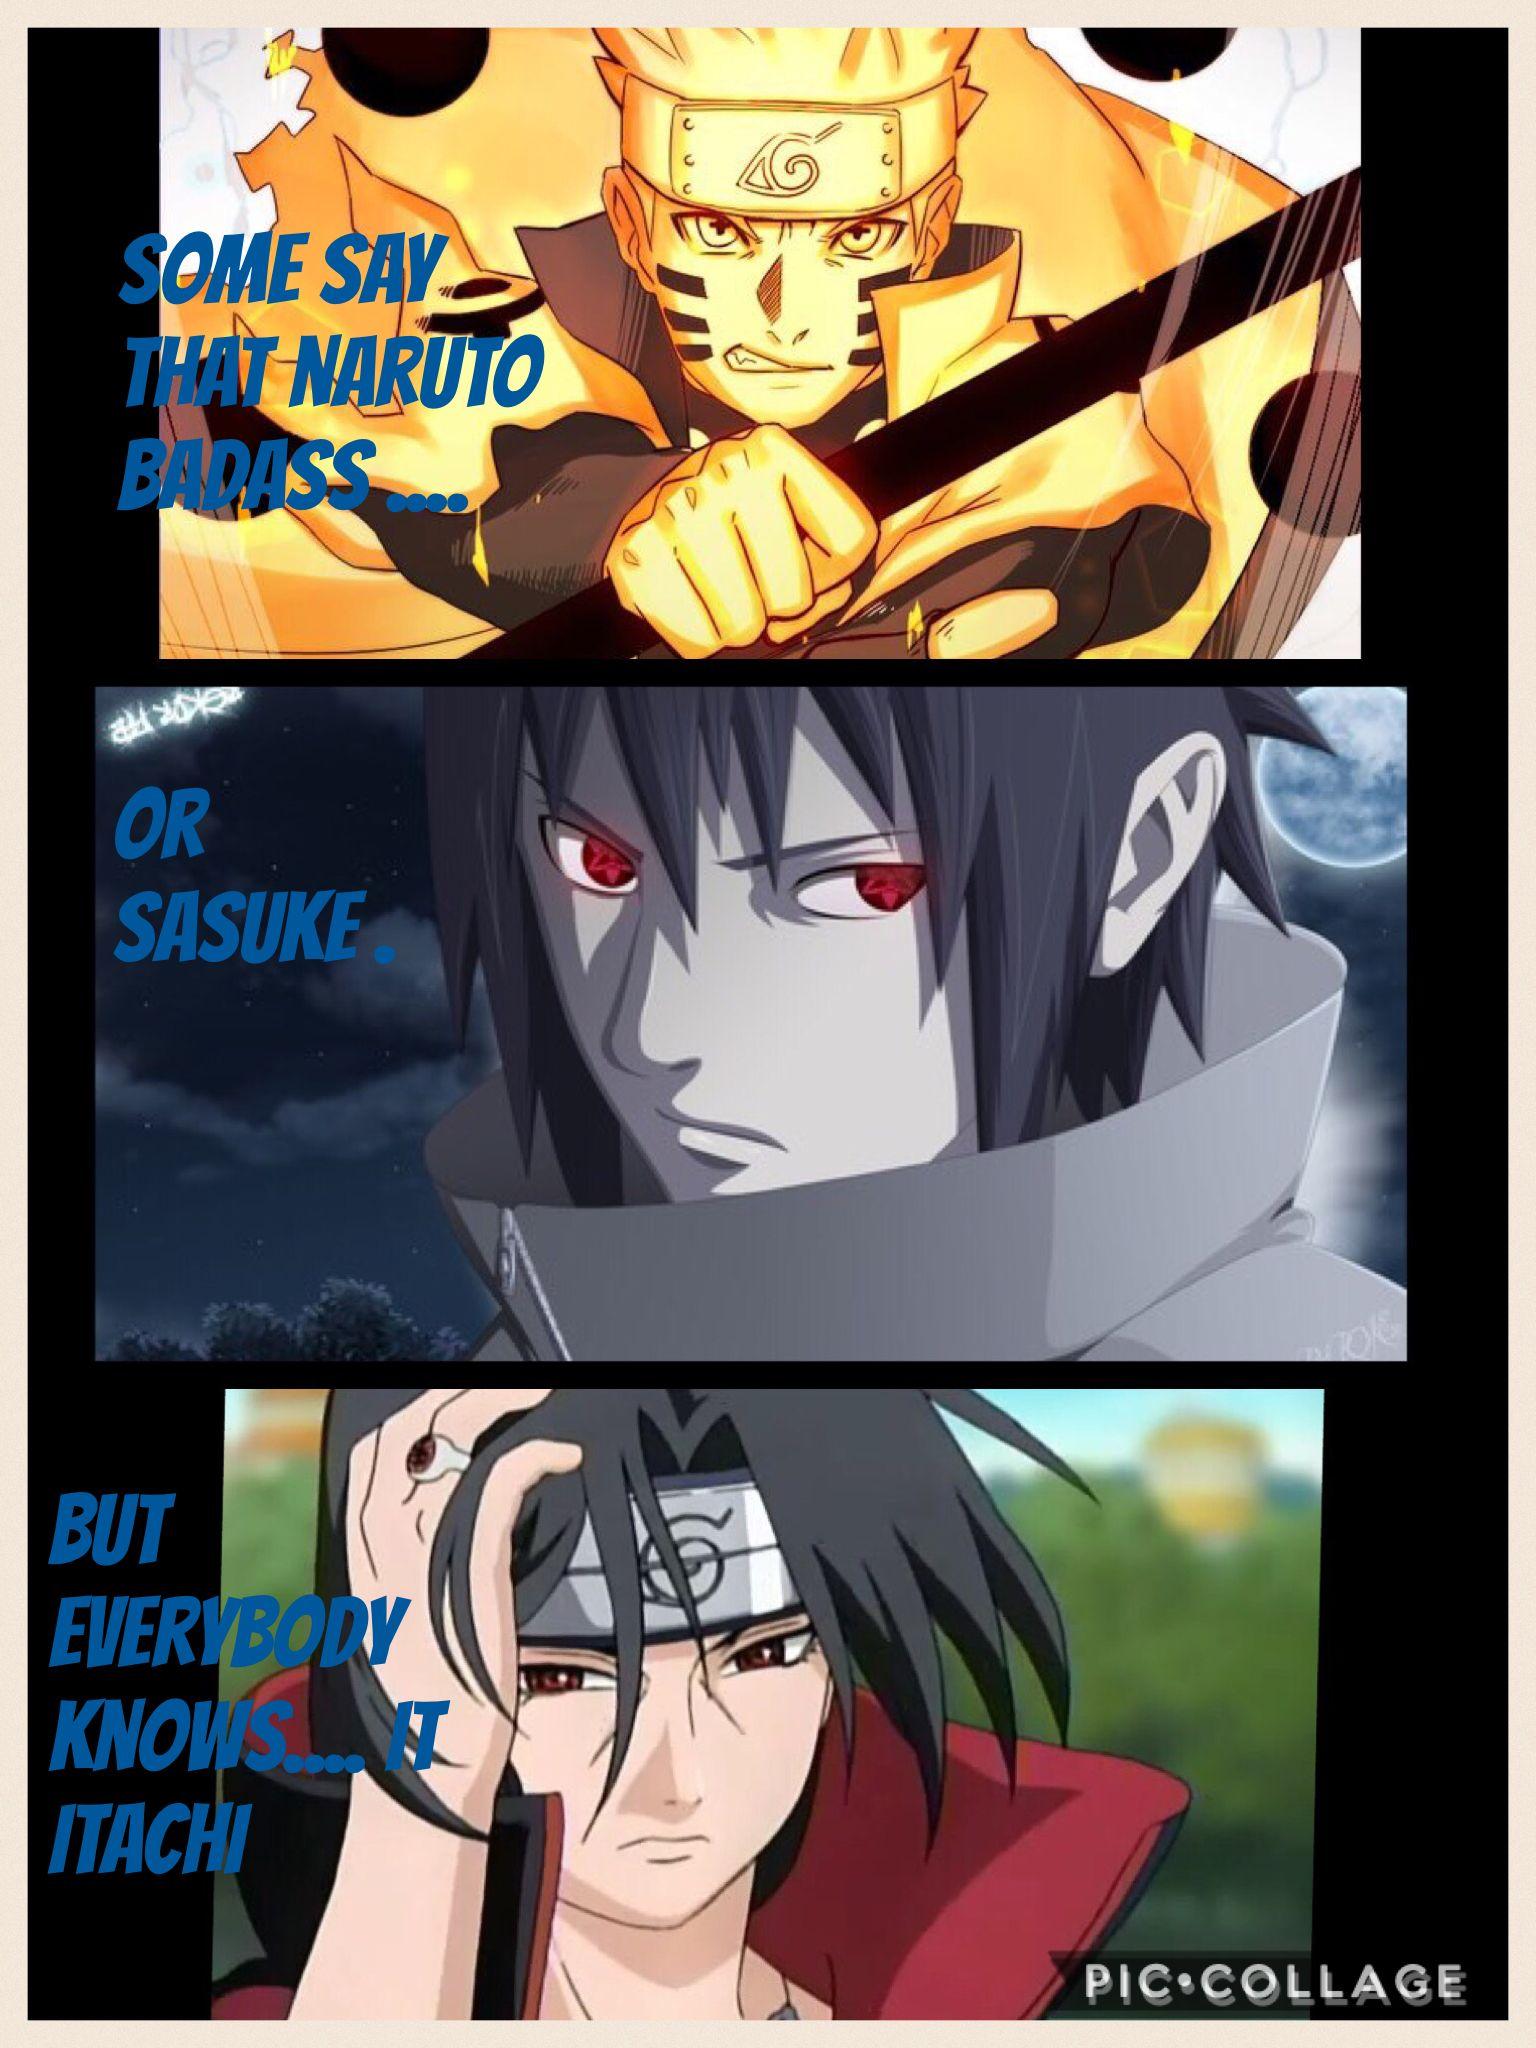 Pin by wolfshadowmoonlover on Naruto Itachi, Anime, Naruto